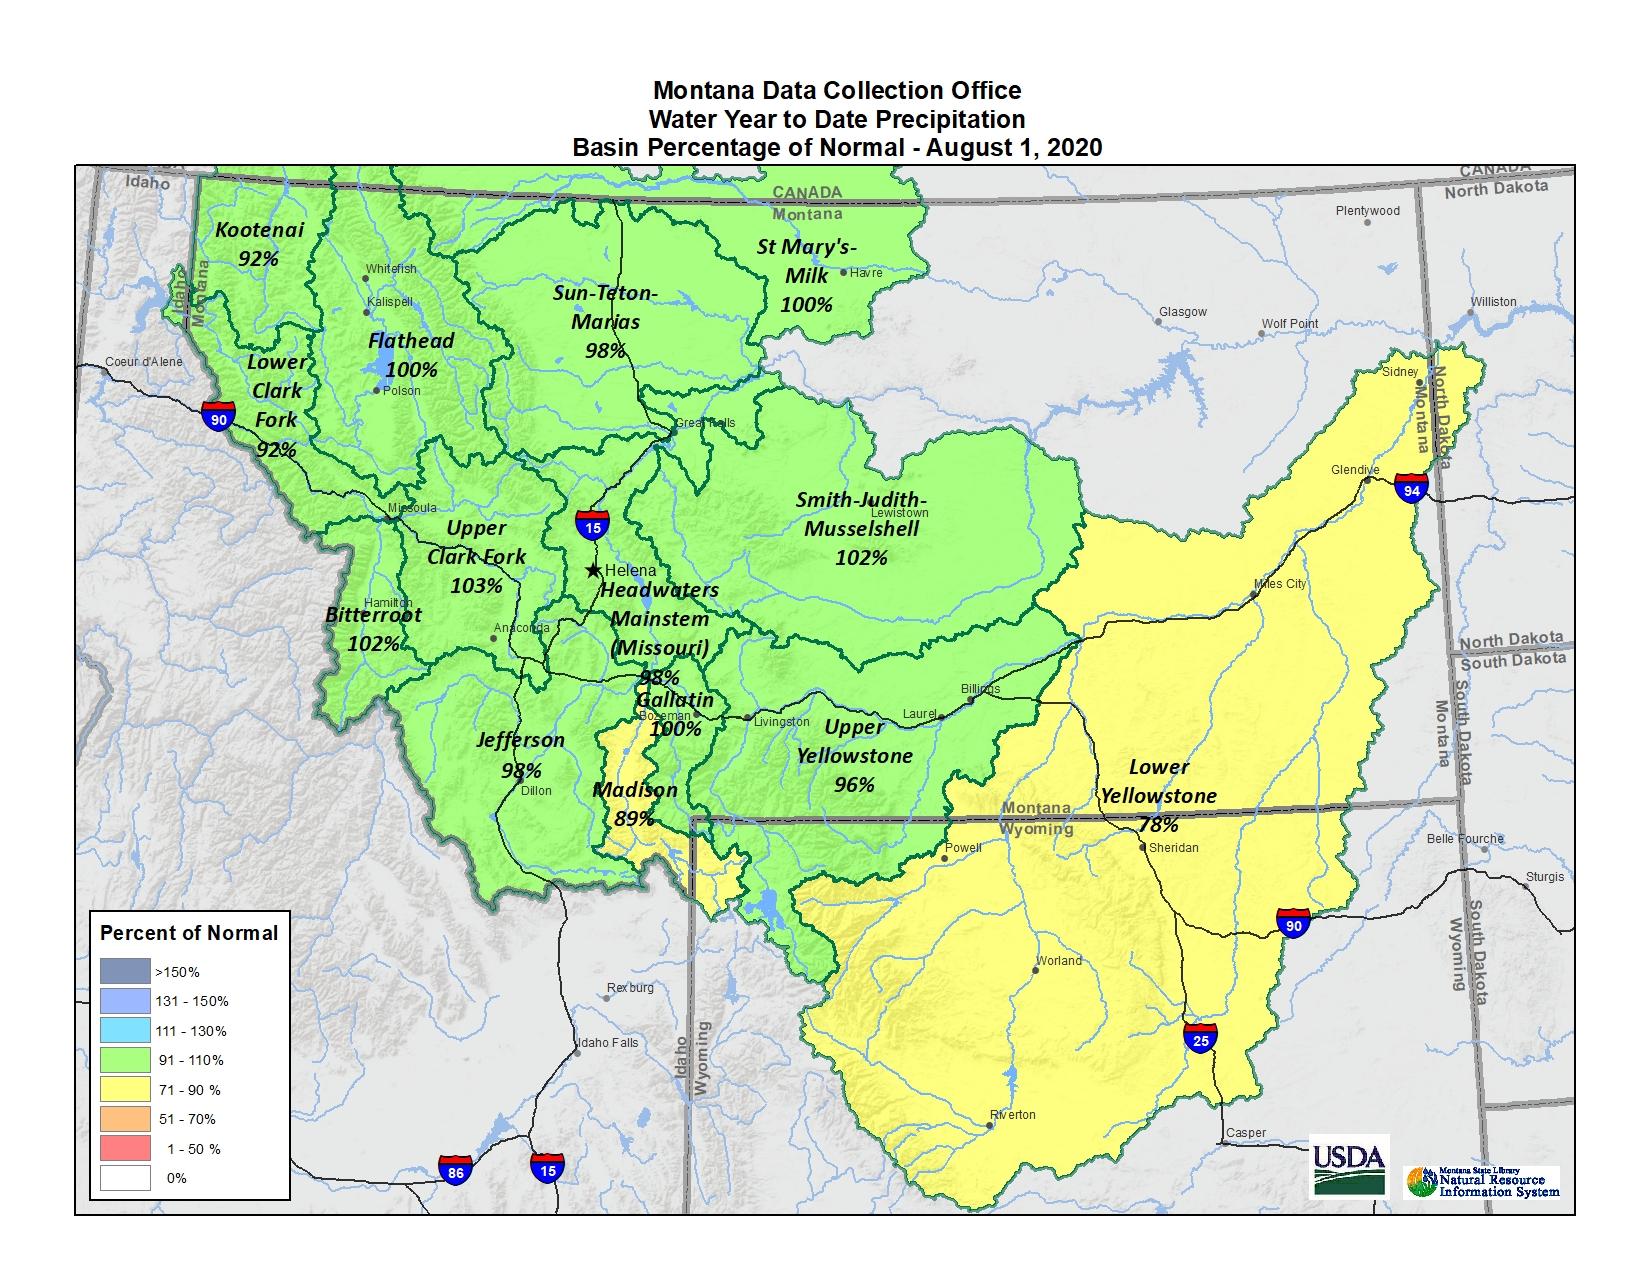 August 2020 Basin Map